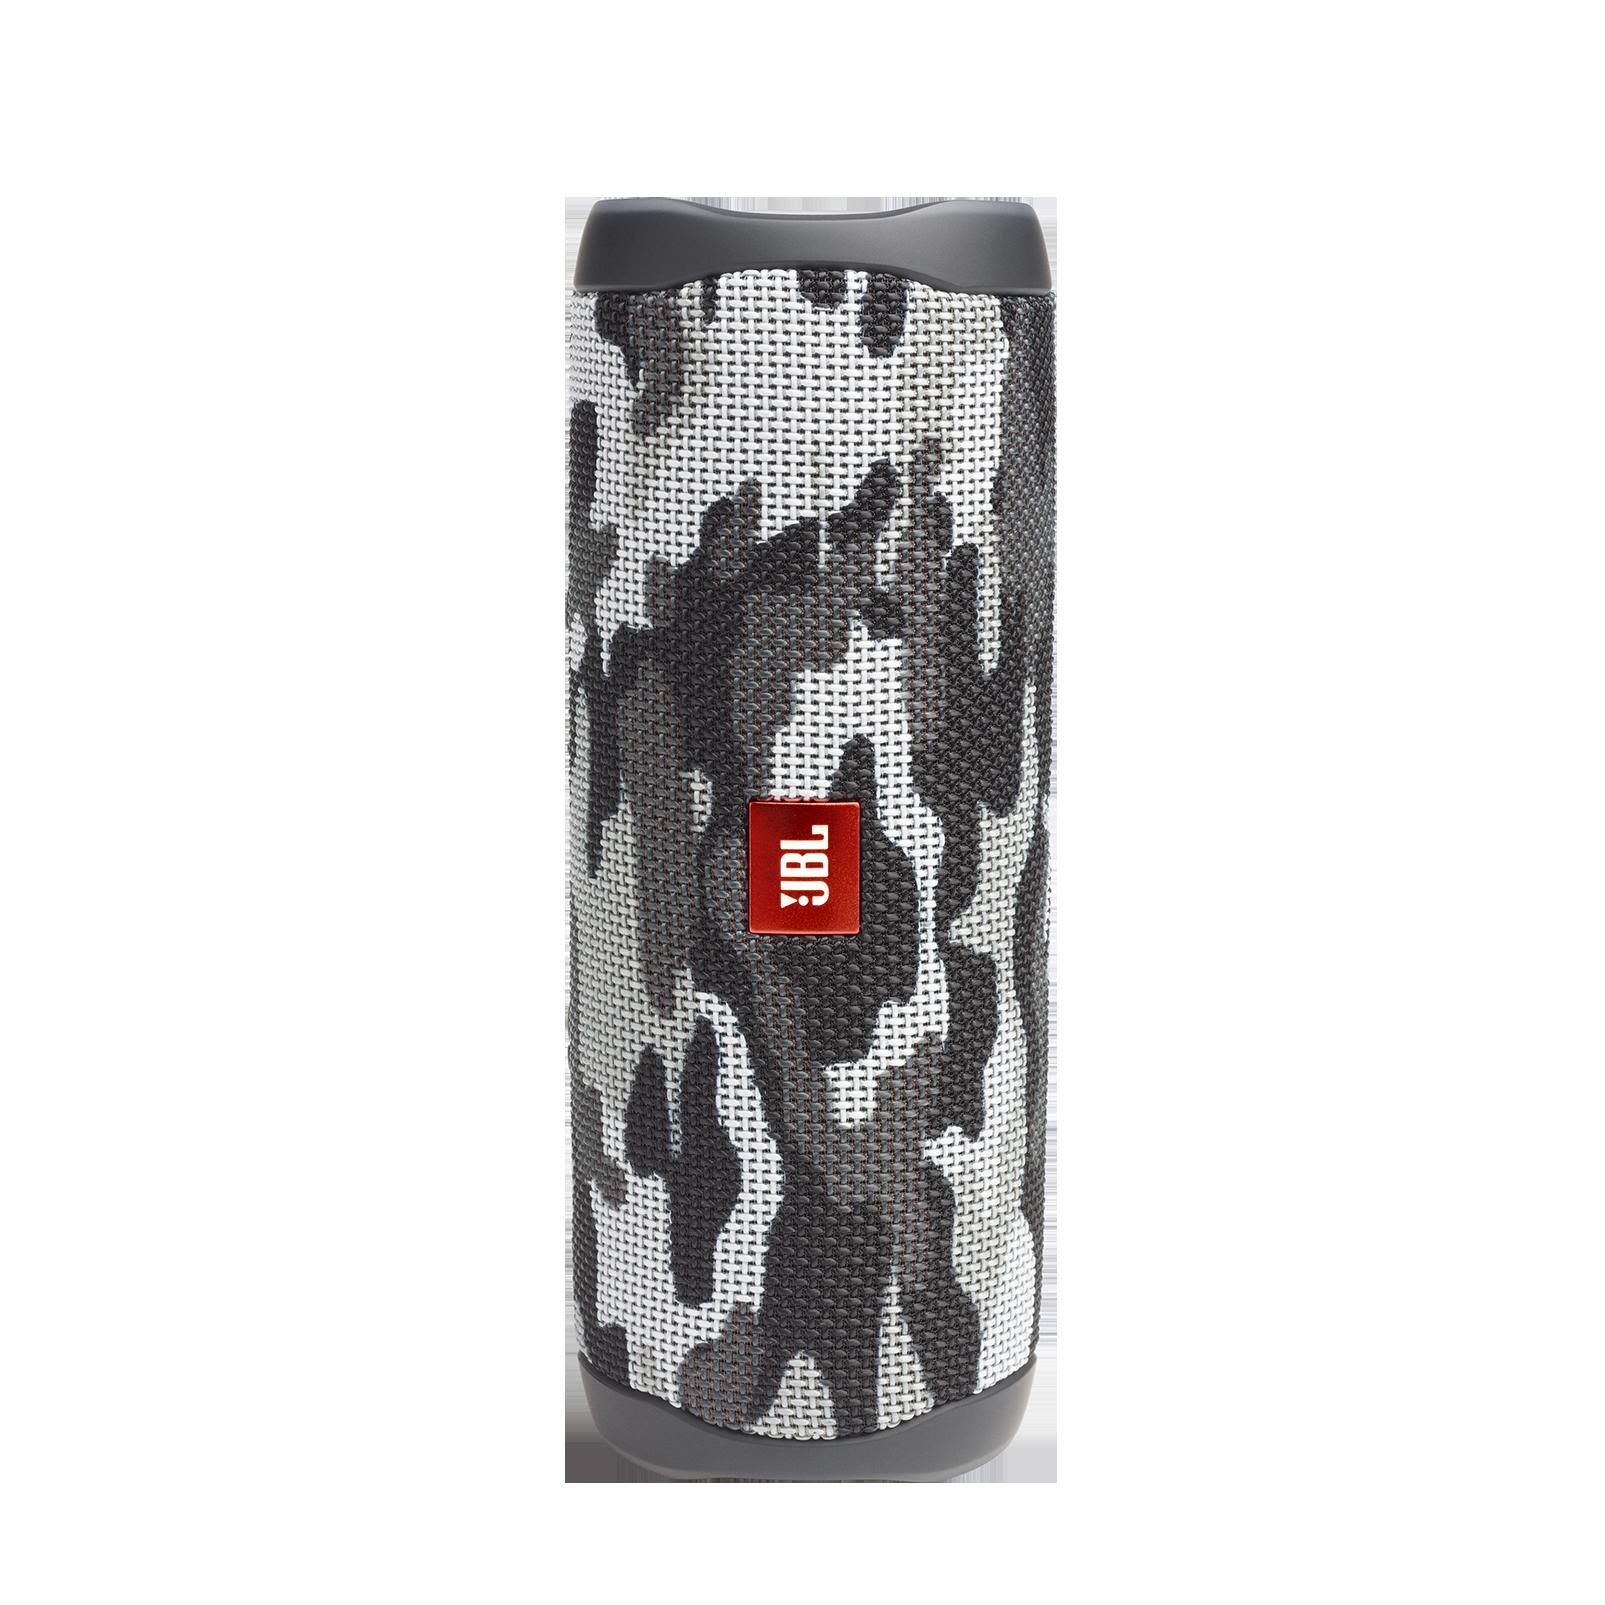 JBL FLIP 5 - Black Camo - Portable Waterproof Speaker - Hero